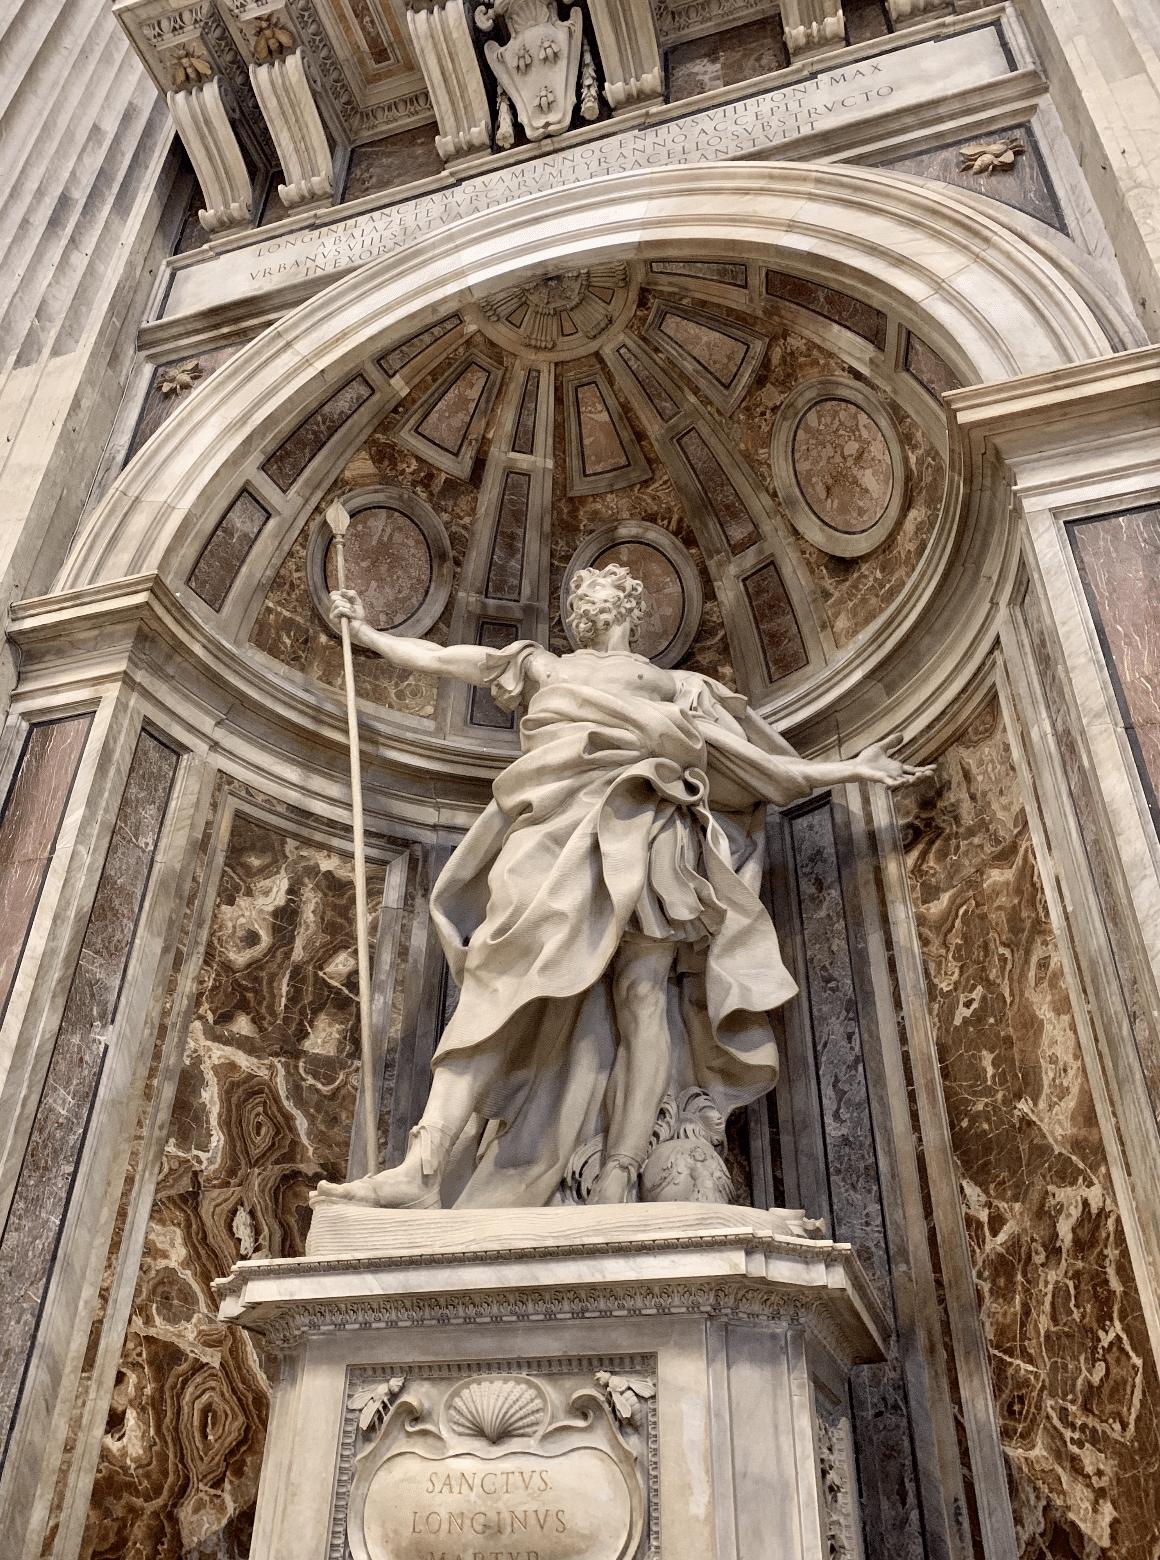 visite du vatican : oeuvre du bernin